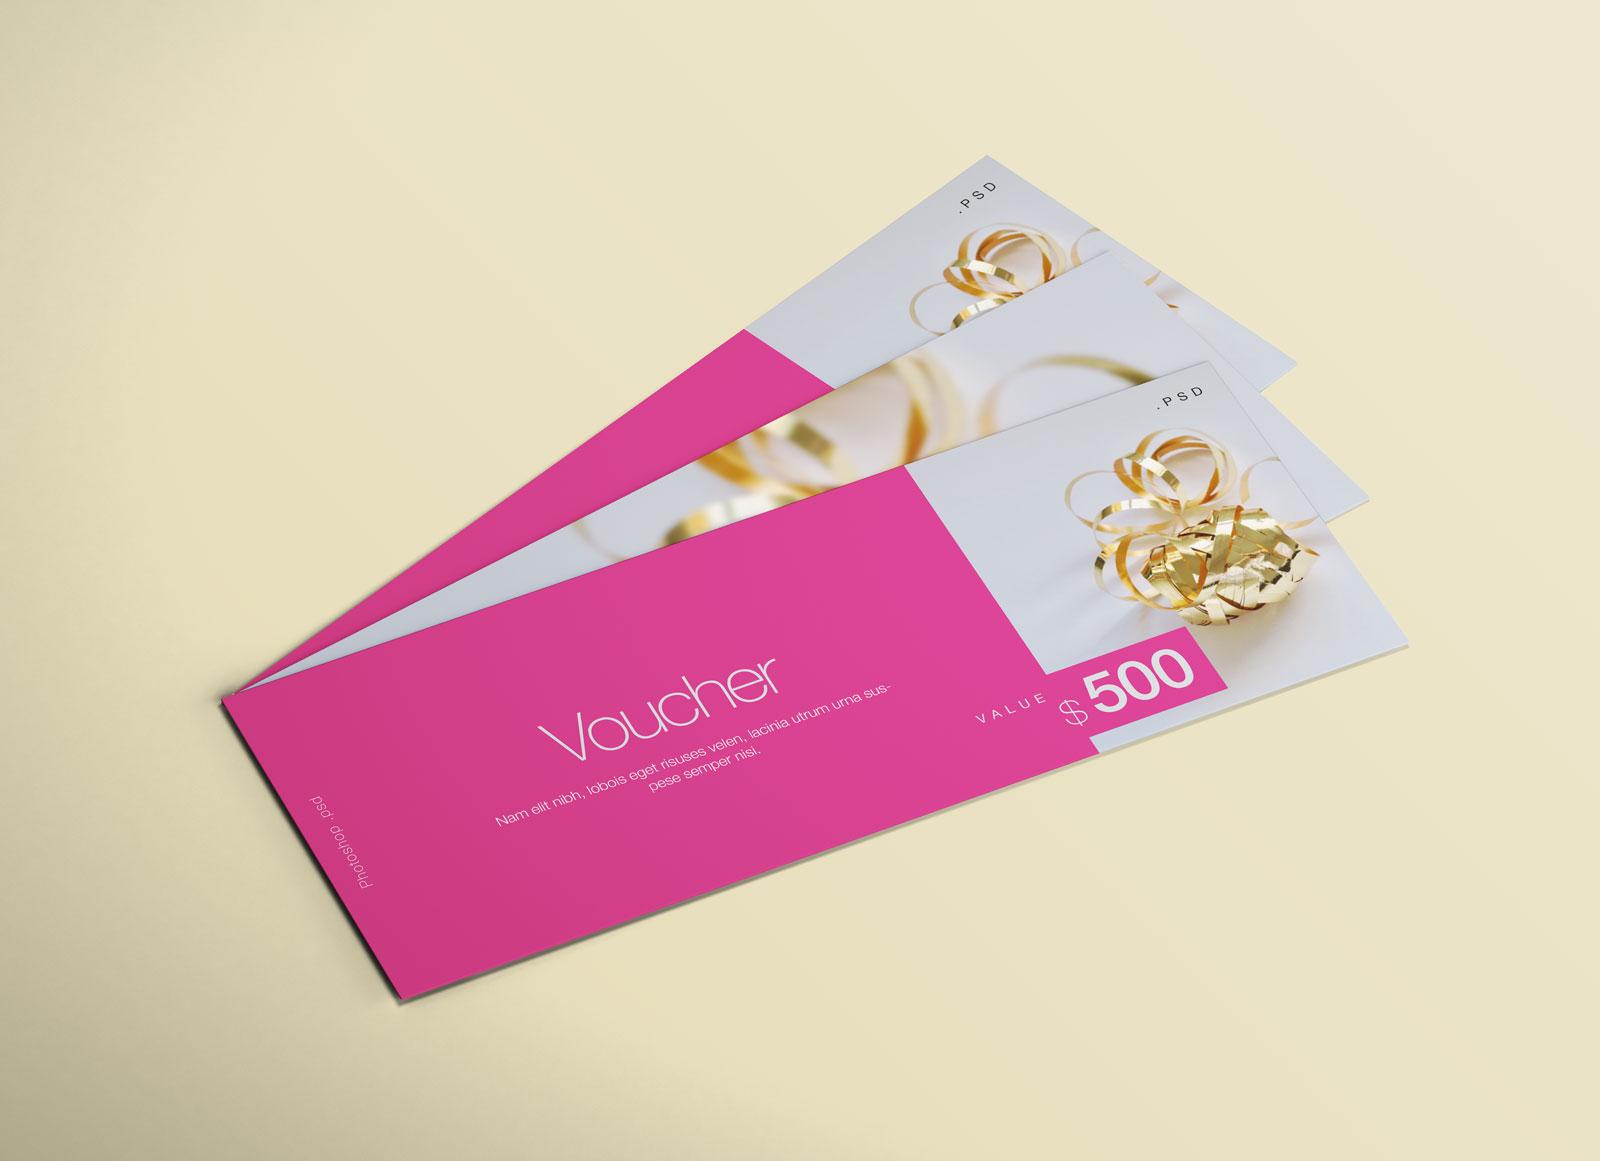 Free-Gift-Voucher-Mockup-PSD